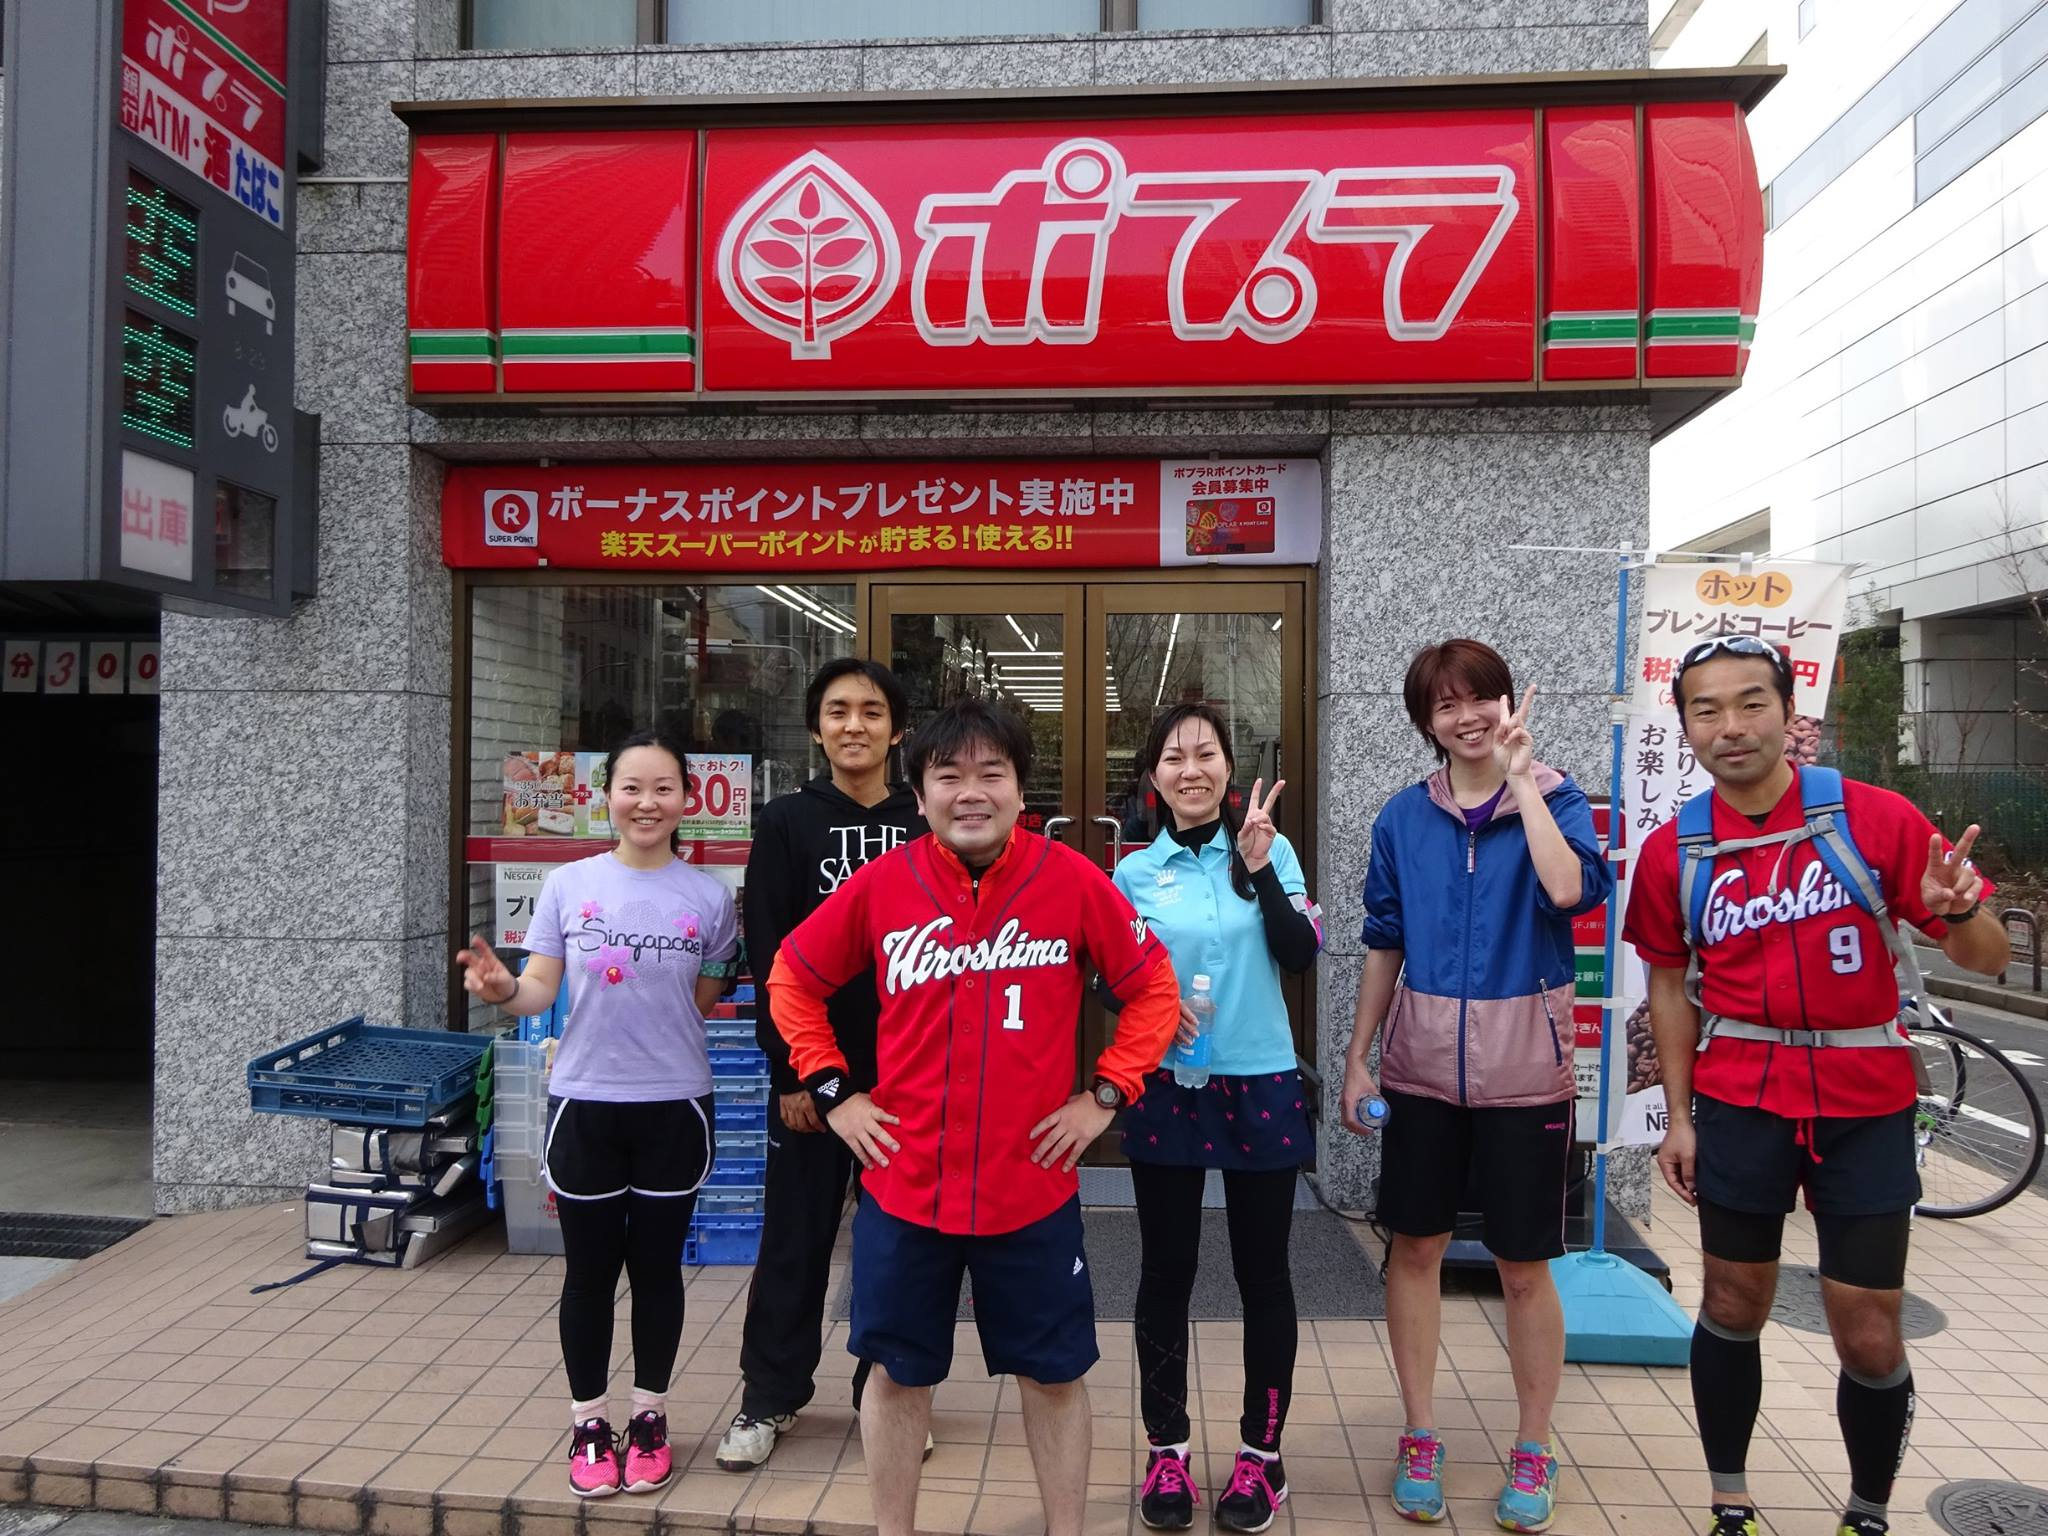 info[5/30開催nextひろしま・レッドランニング2015]のご案内